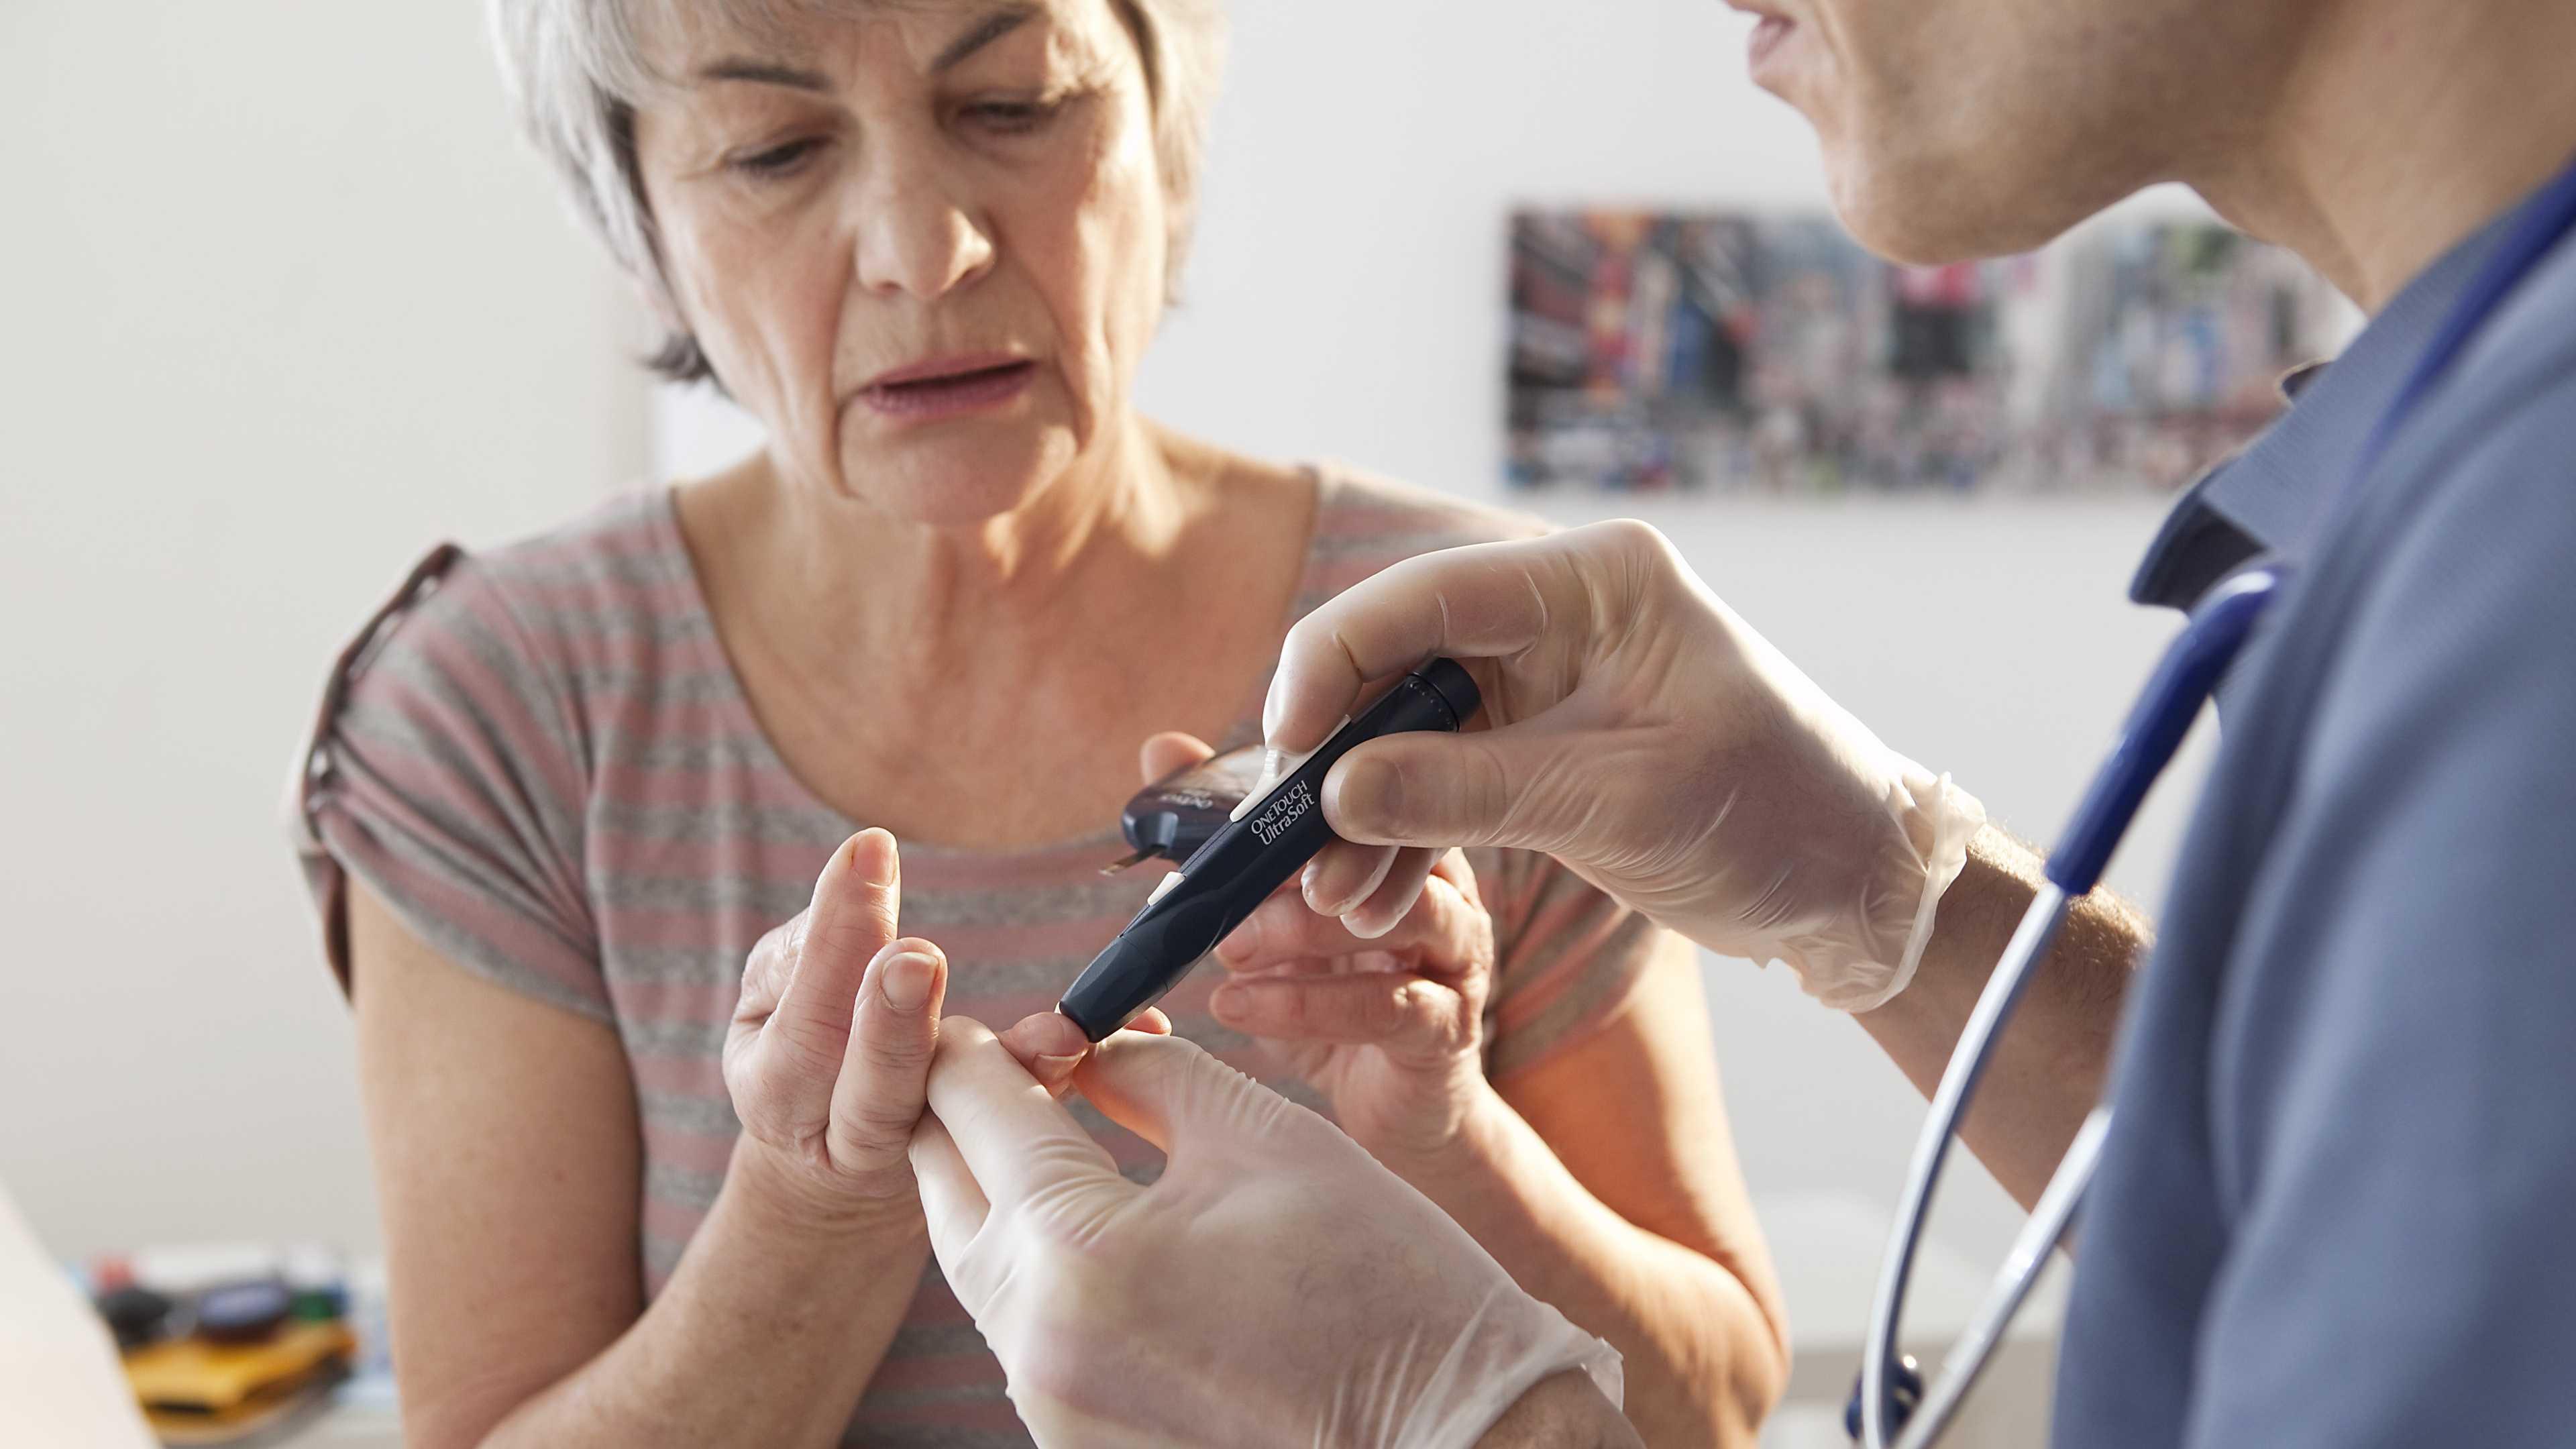 Риск смерти от COVID-19 при диабете второго типа выше, чем первого